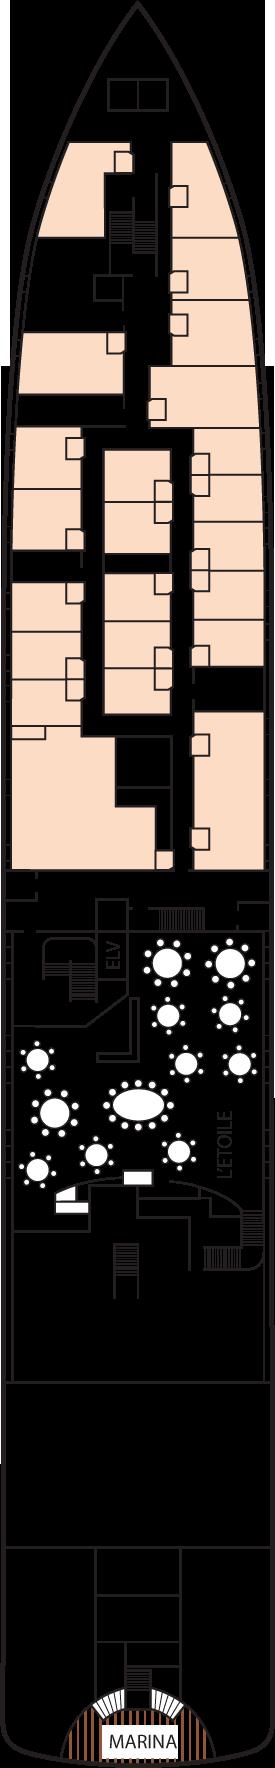 m/v Tere Moana Deck 2: Deck 2